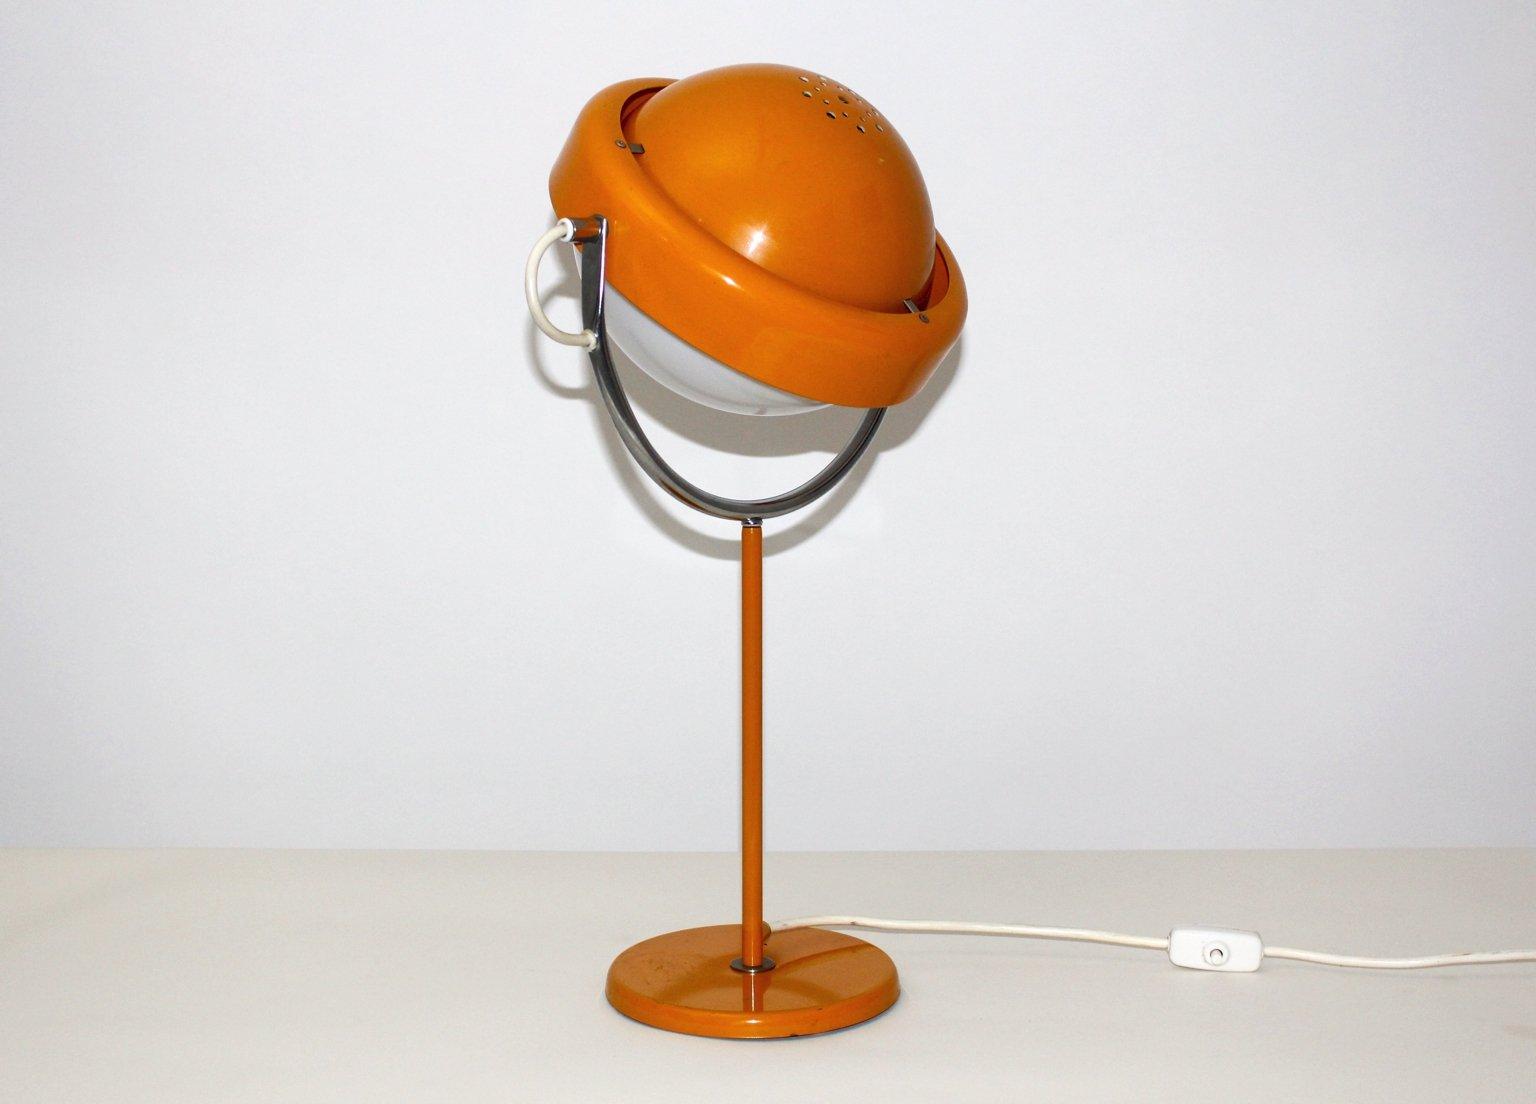 table lighting furniture lamps winsome shade orange fresh cute models lamp design ideas